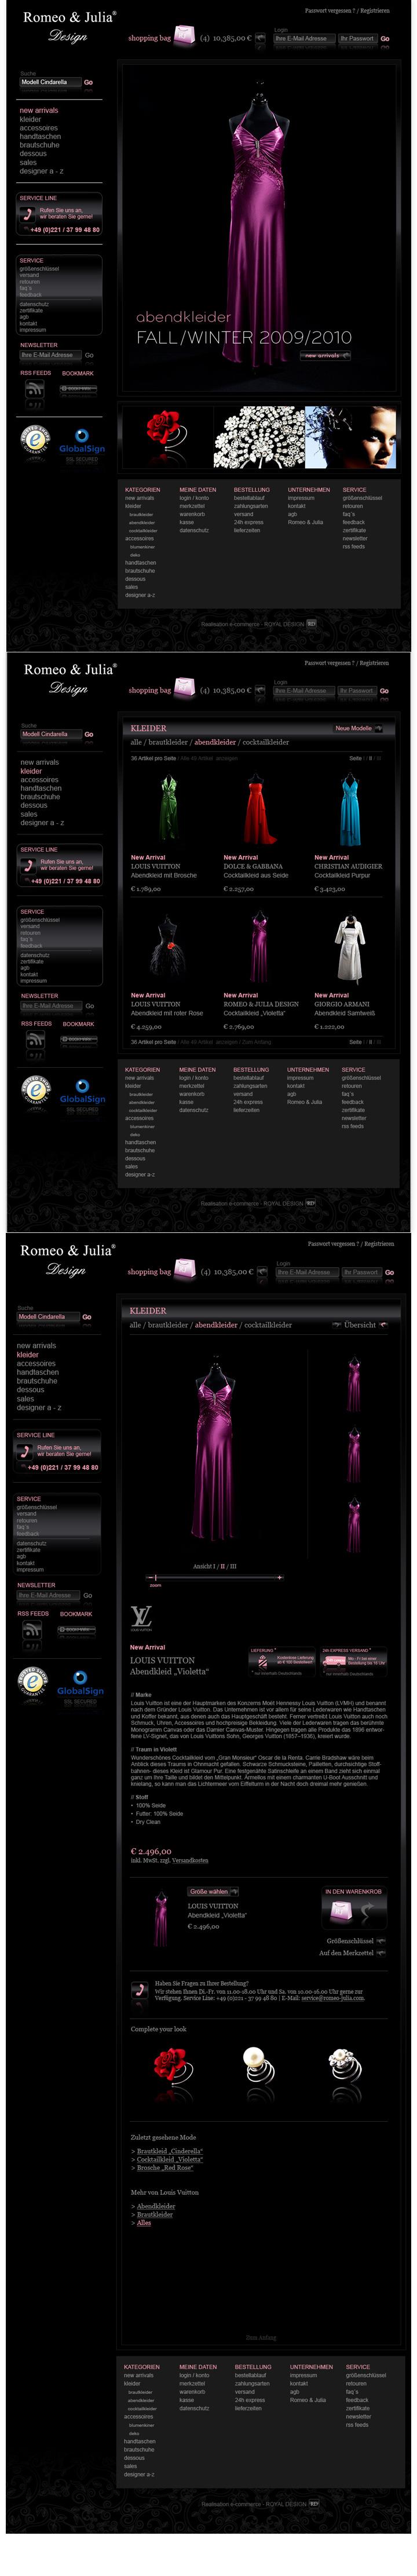 romeo-julia-design-05